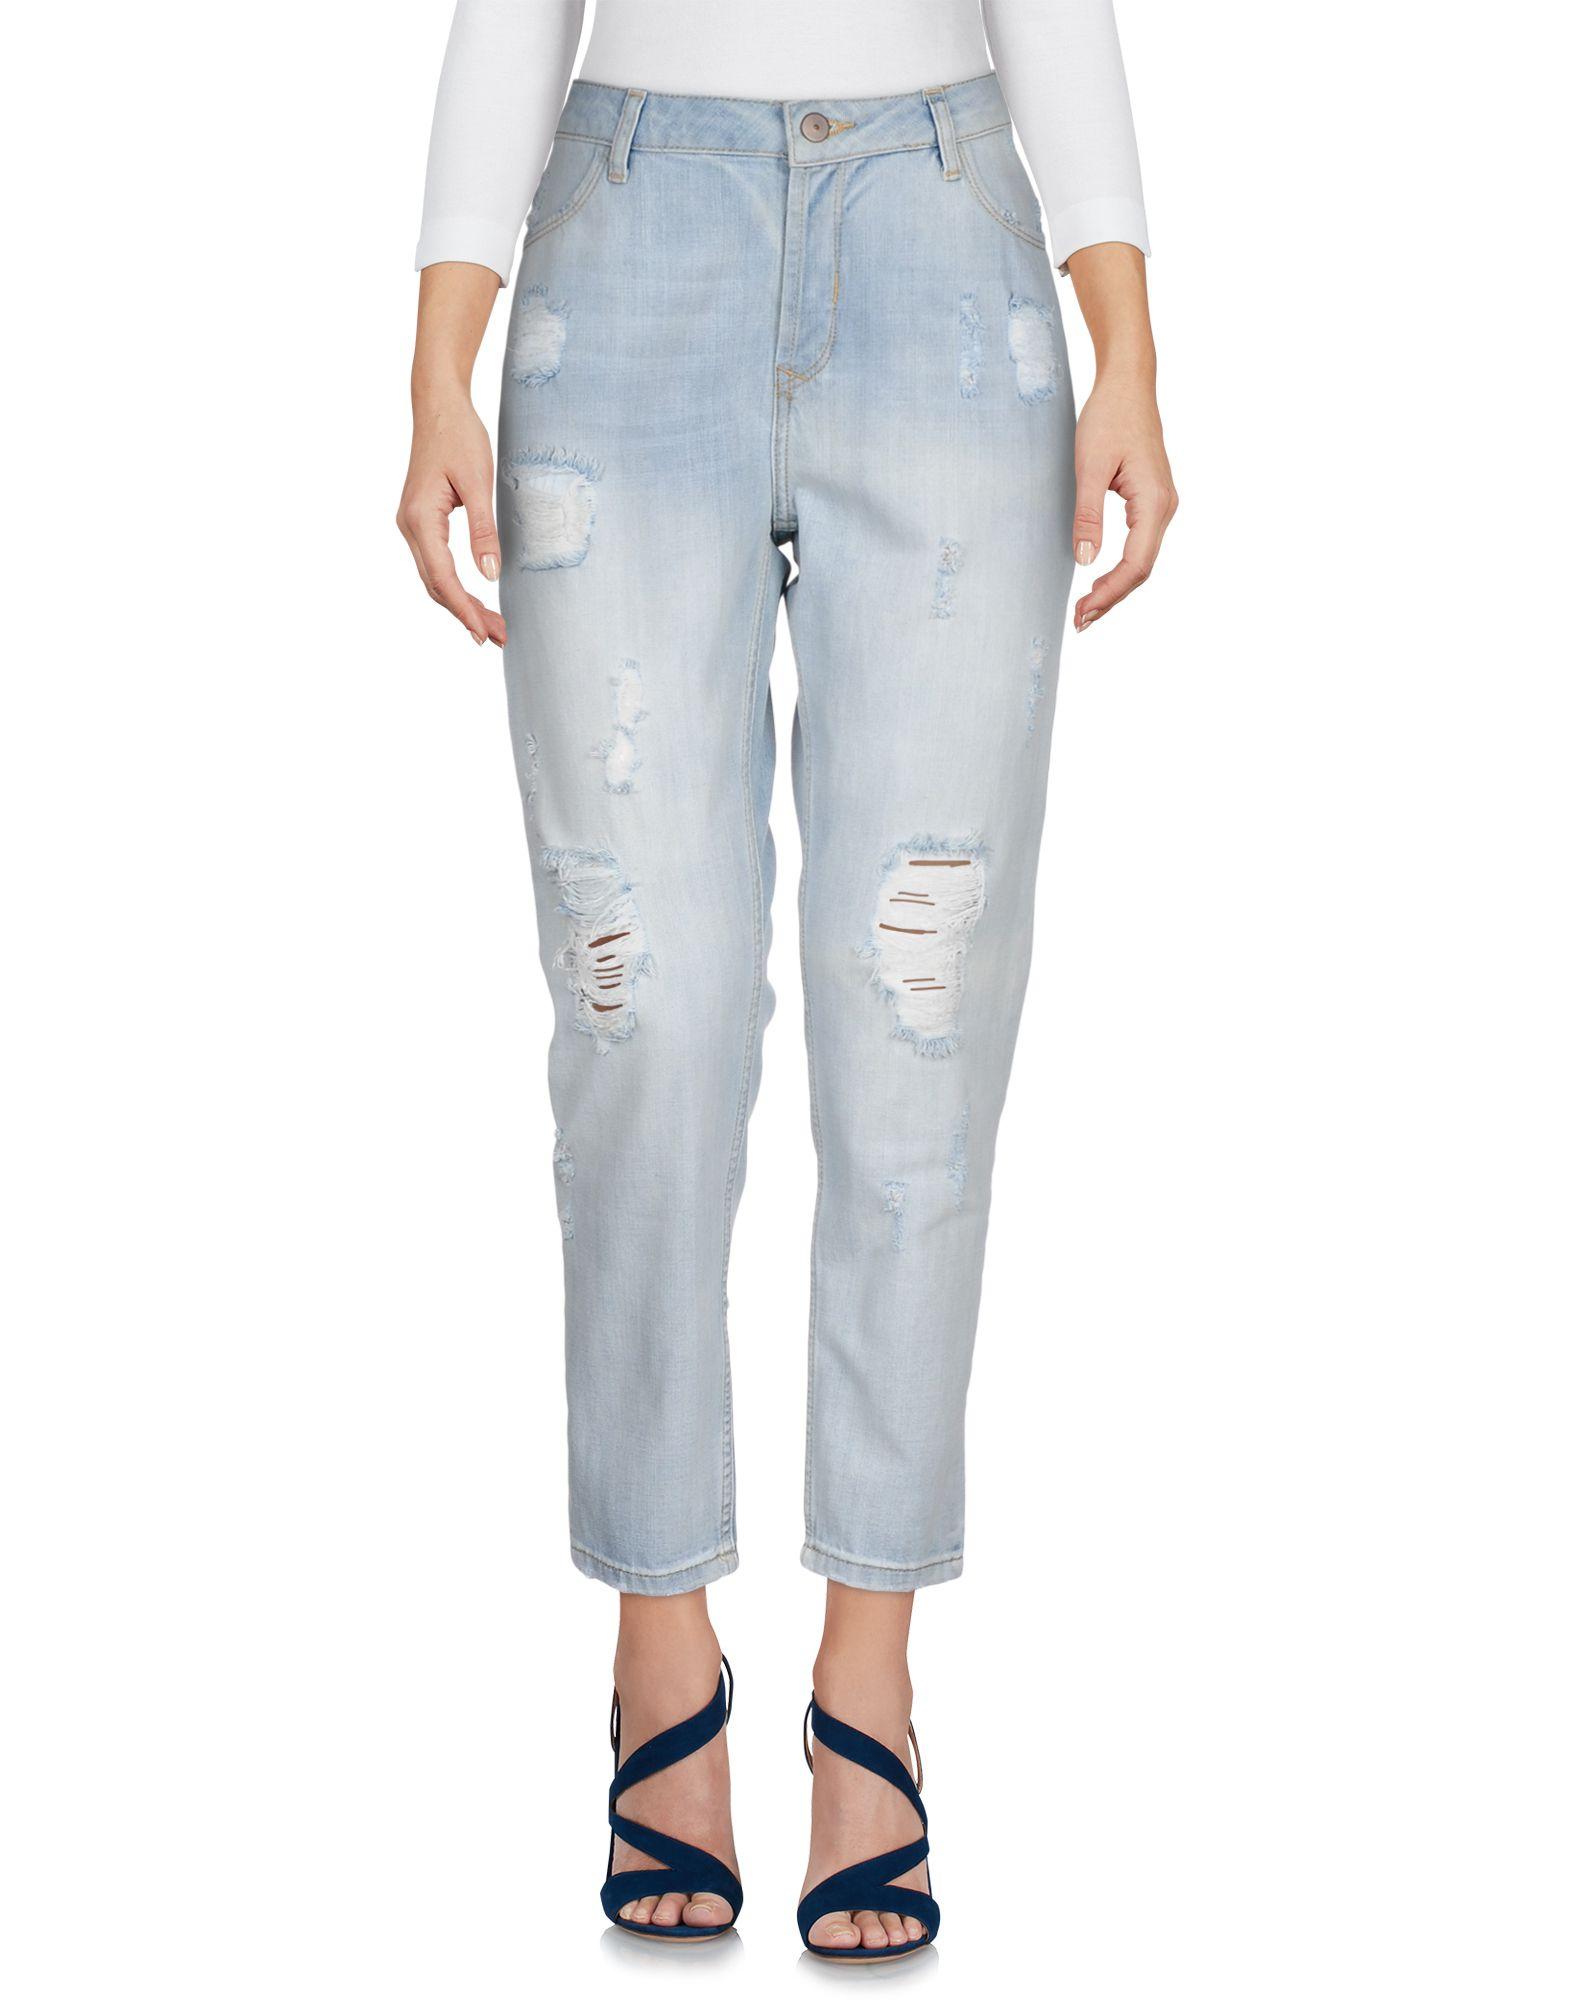 JUST FEMALE Denim Pants in Blue